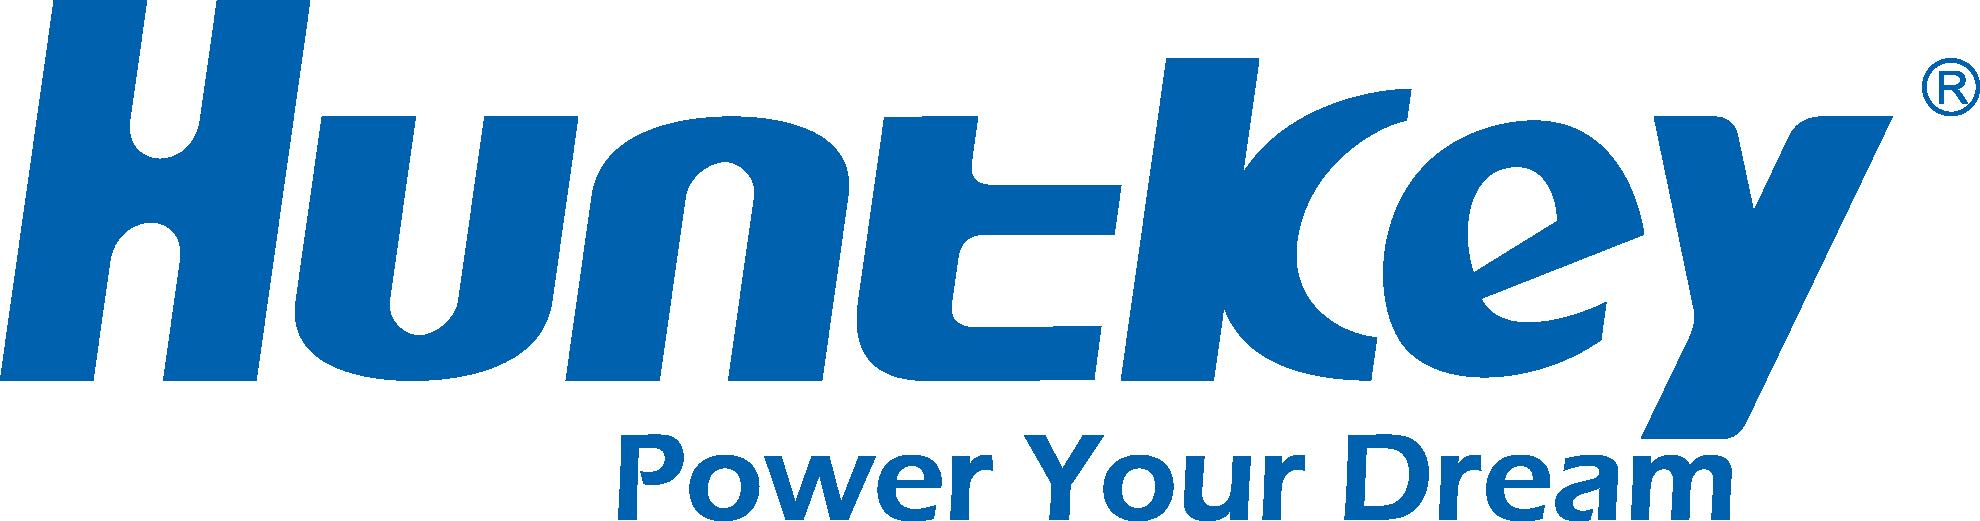 Huntkey-Logo-PNG-Format Downloads